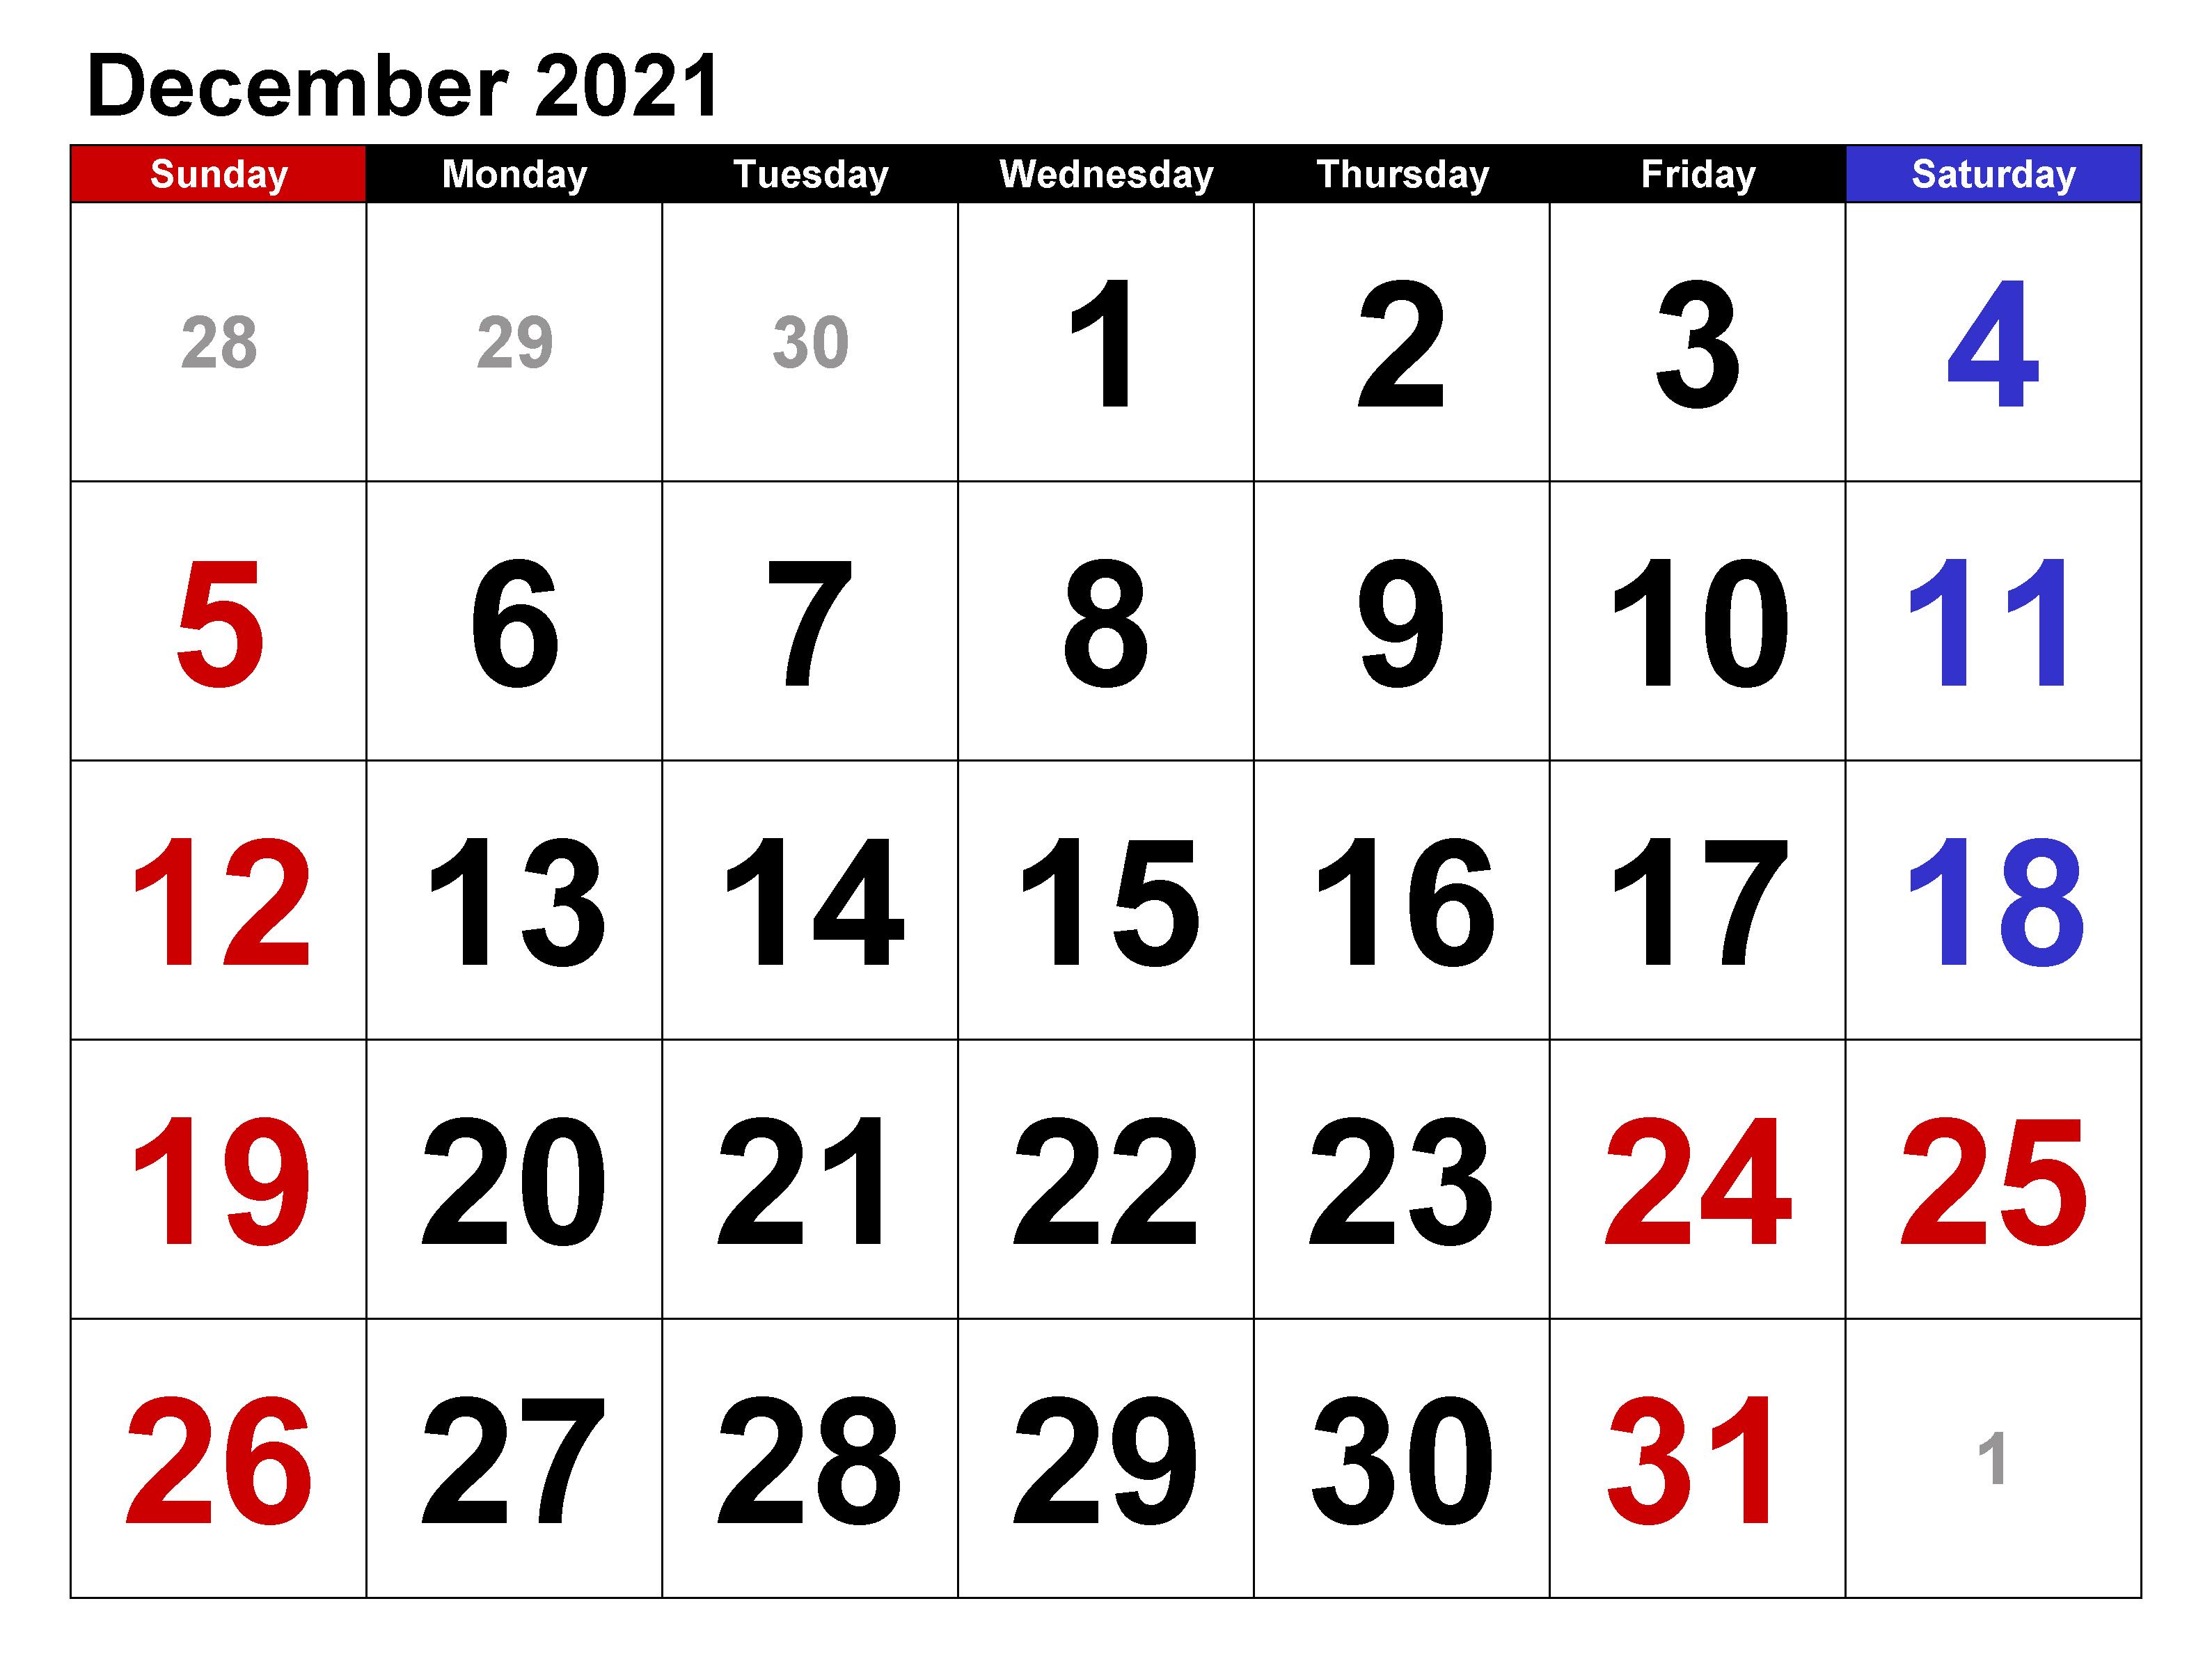 December 2021 Calendar Template for Google Sheets